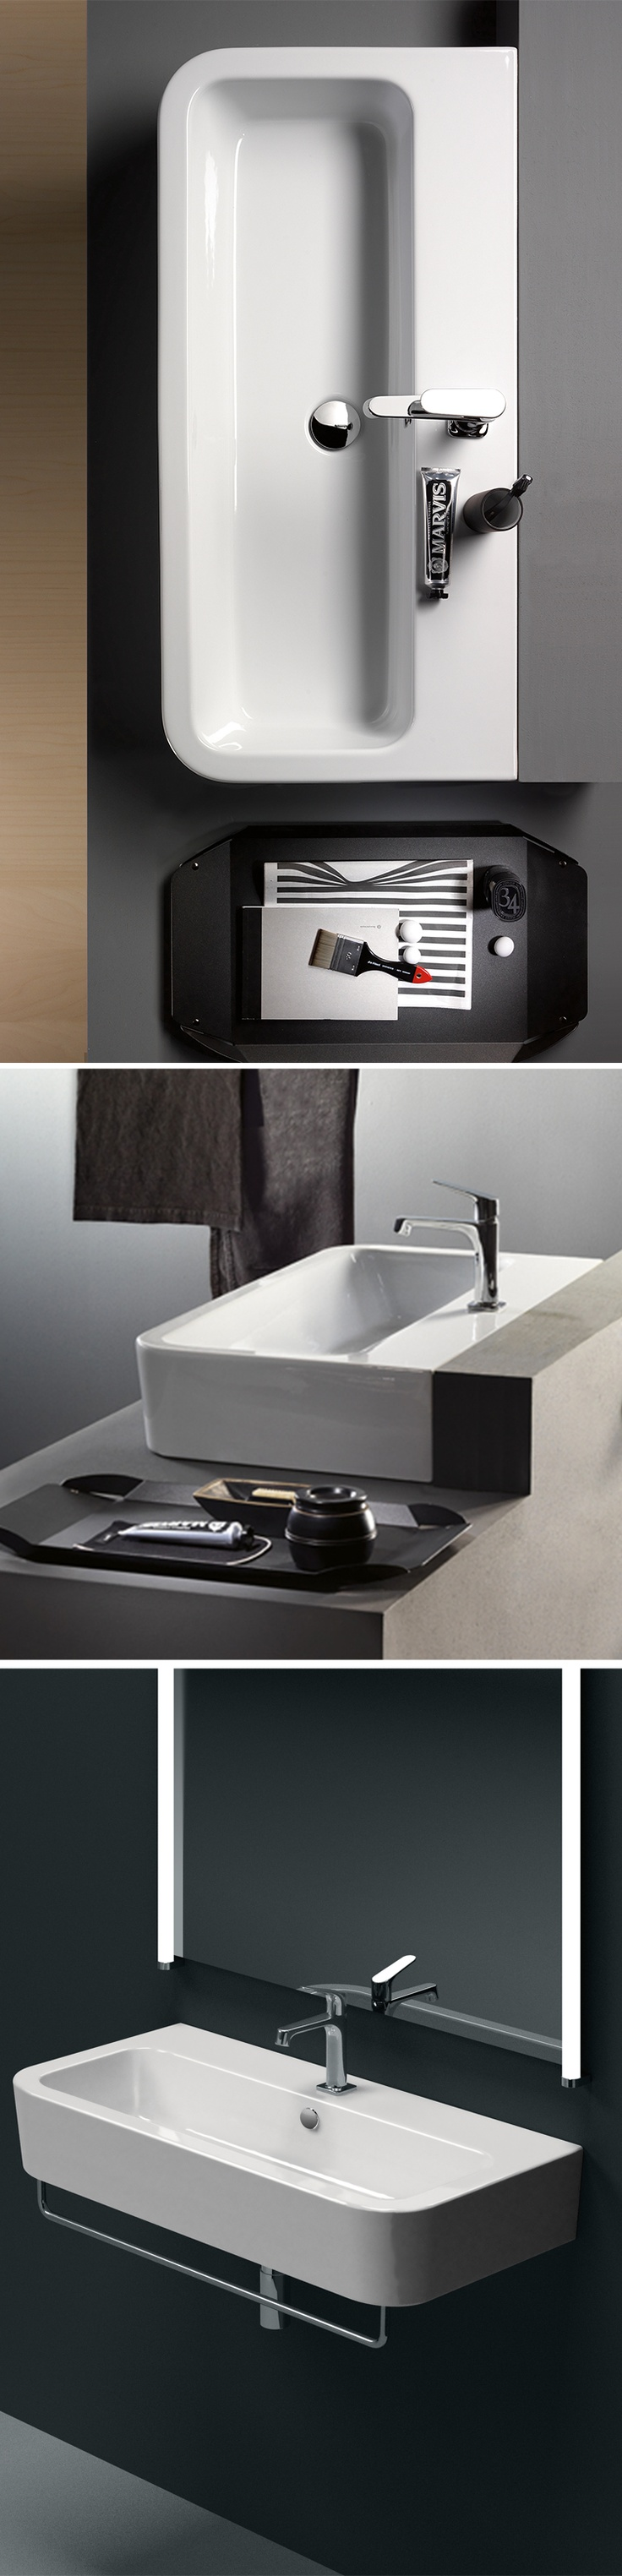 GSI ceramic | Traccia, Washbasin 90x44  #GSIceramica #BathroomDesign #Washbasins #Sanitaryware